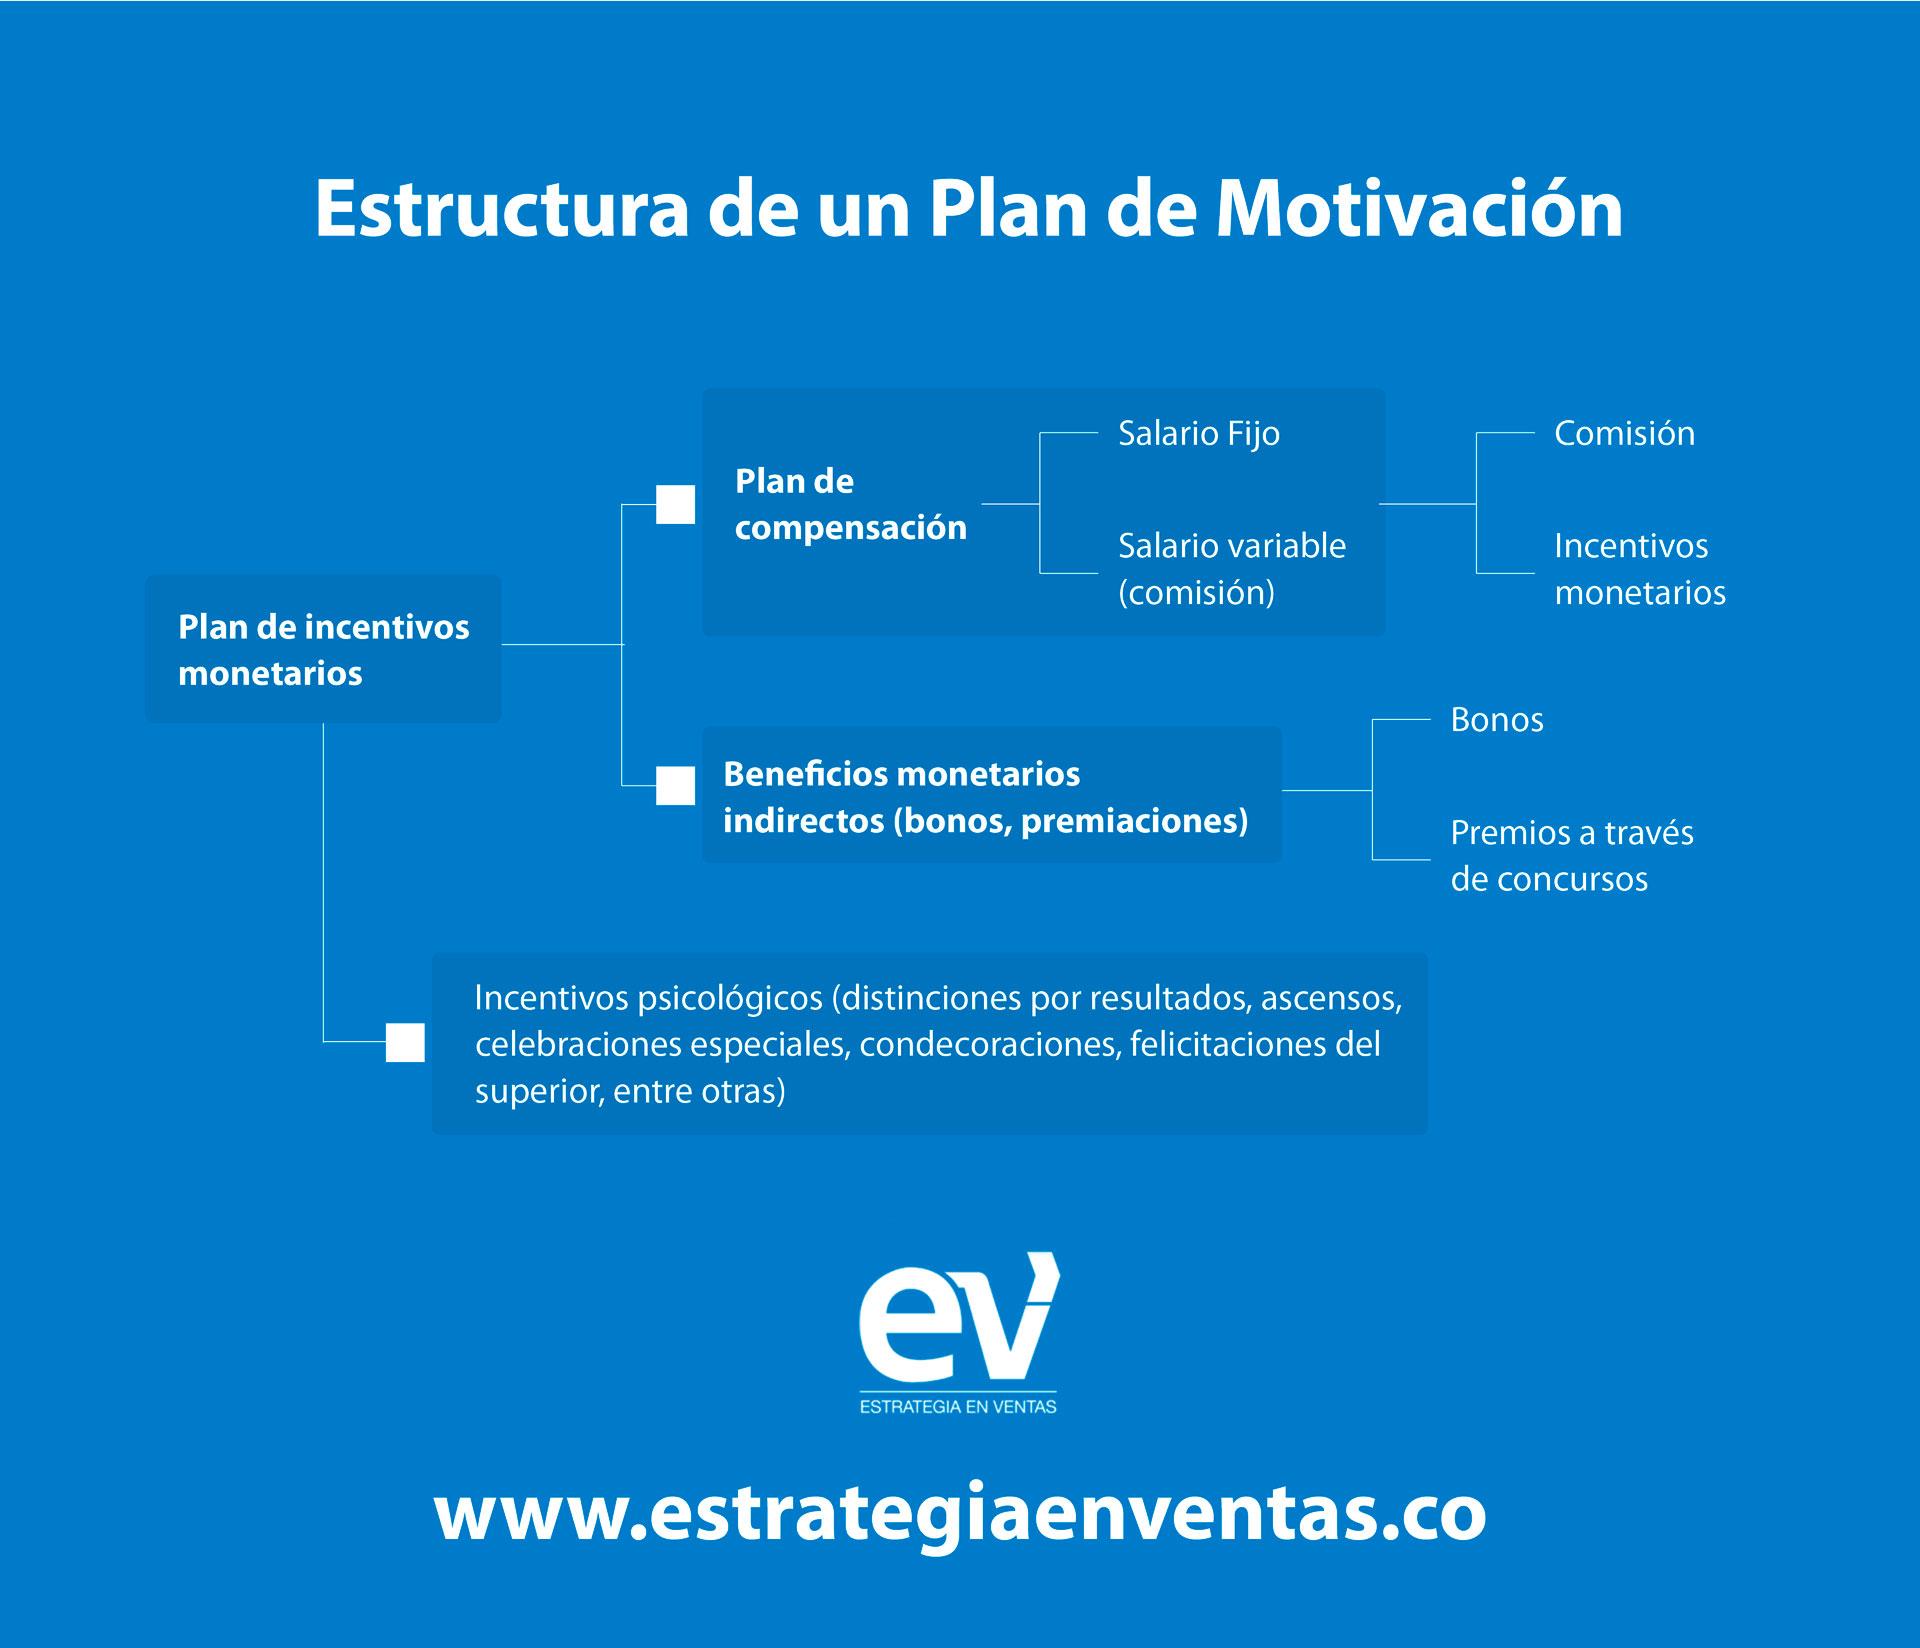 Estructura de un Plan de Motivacion